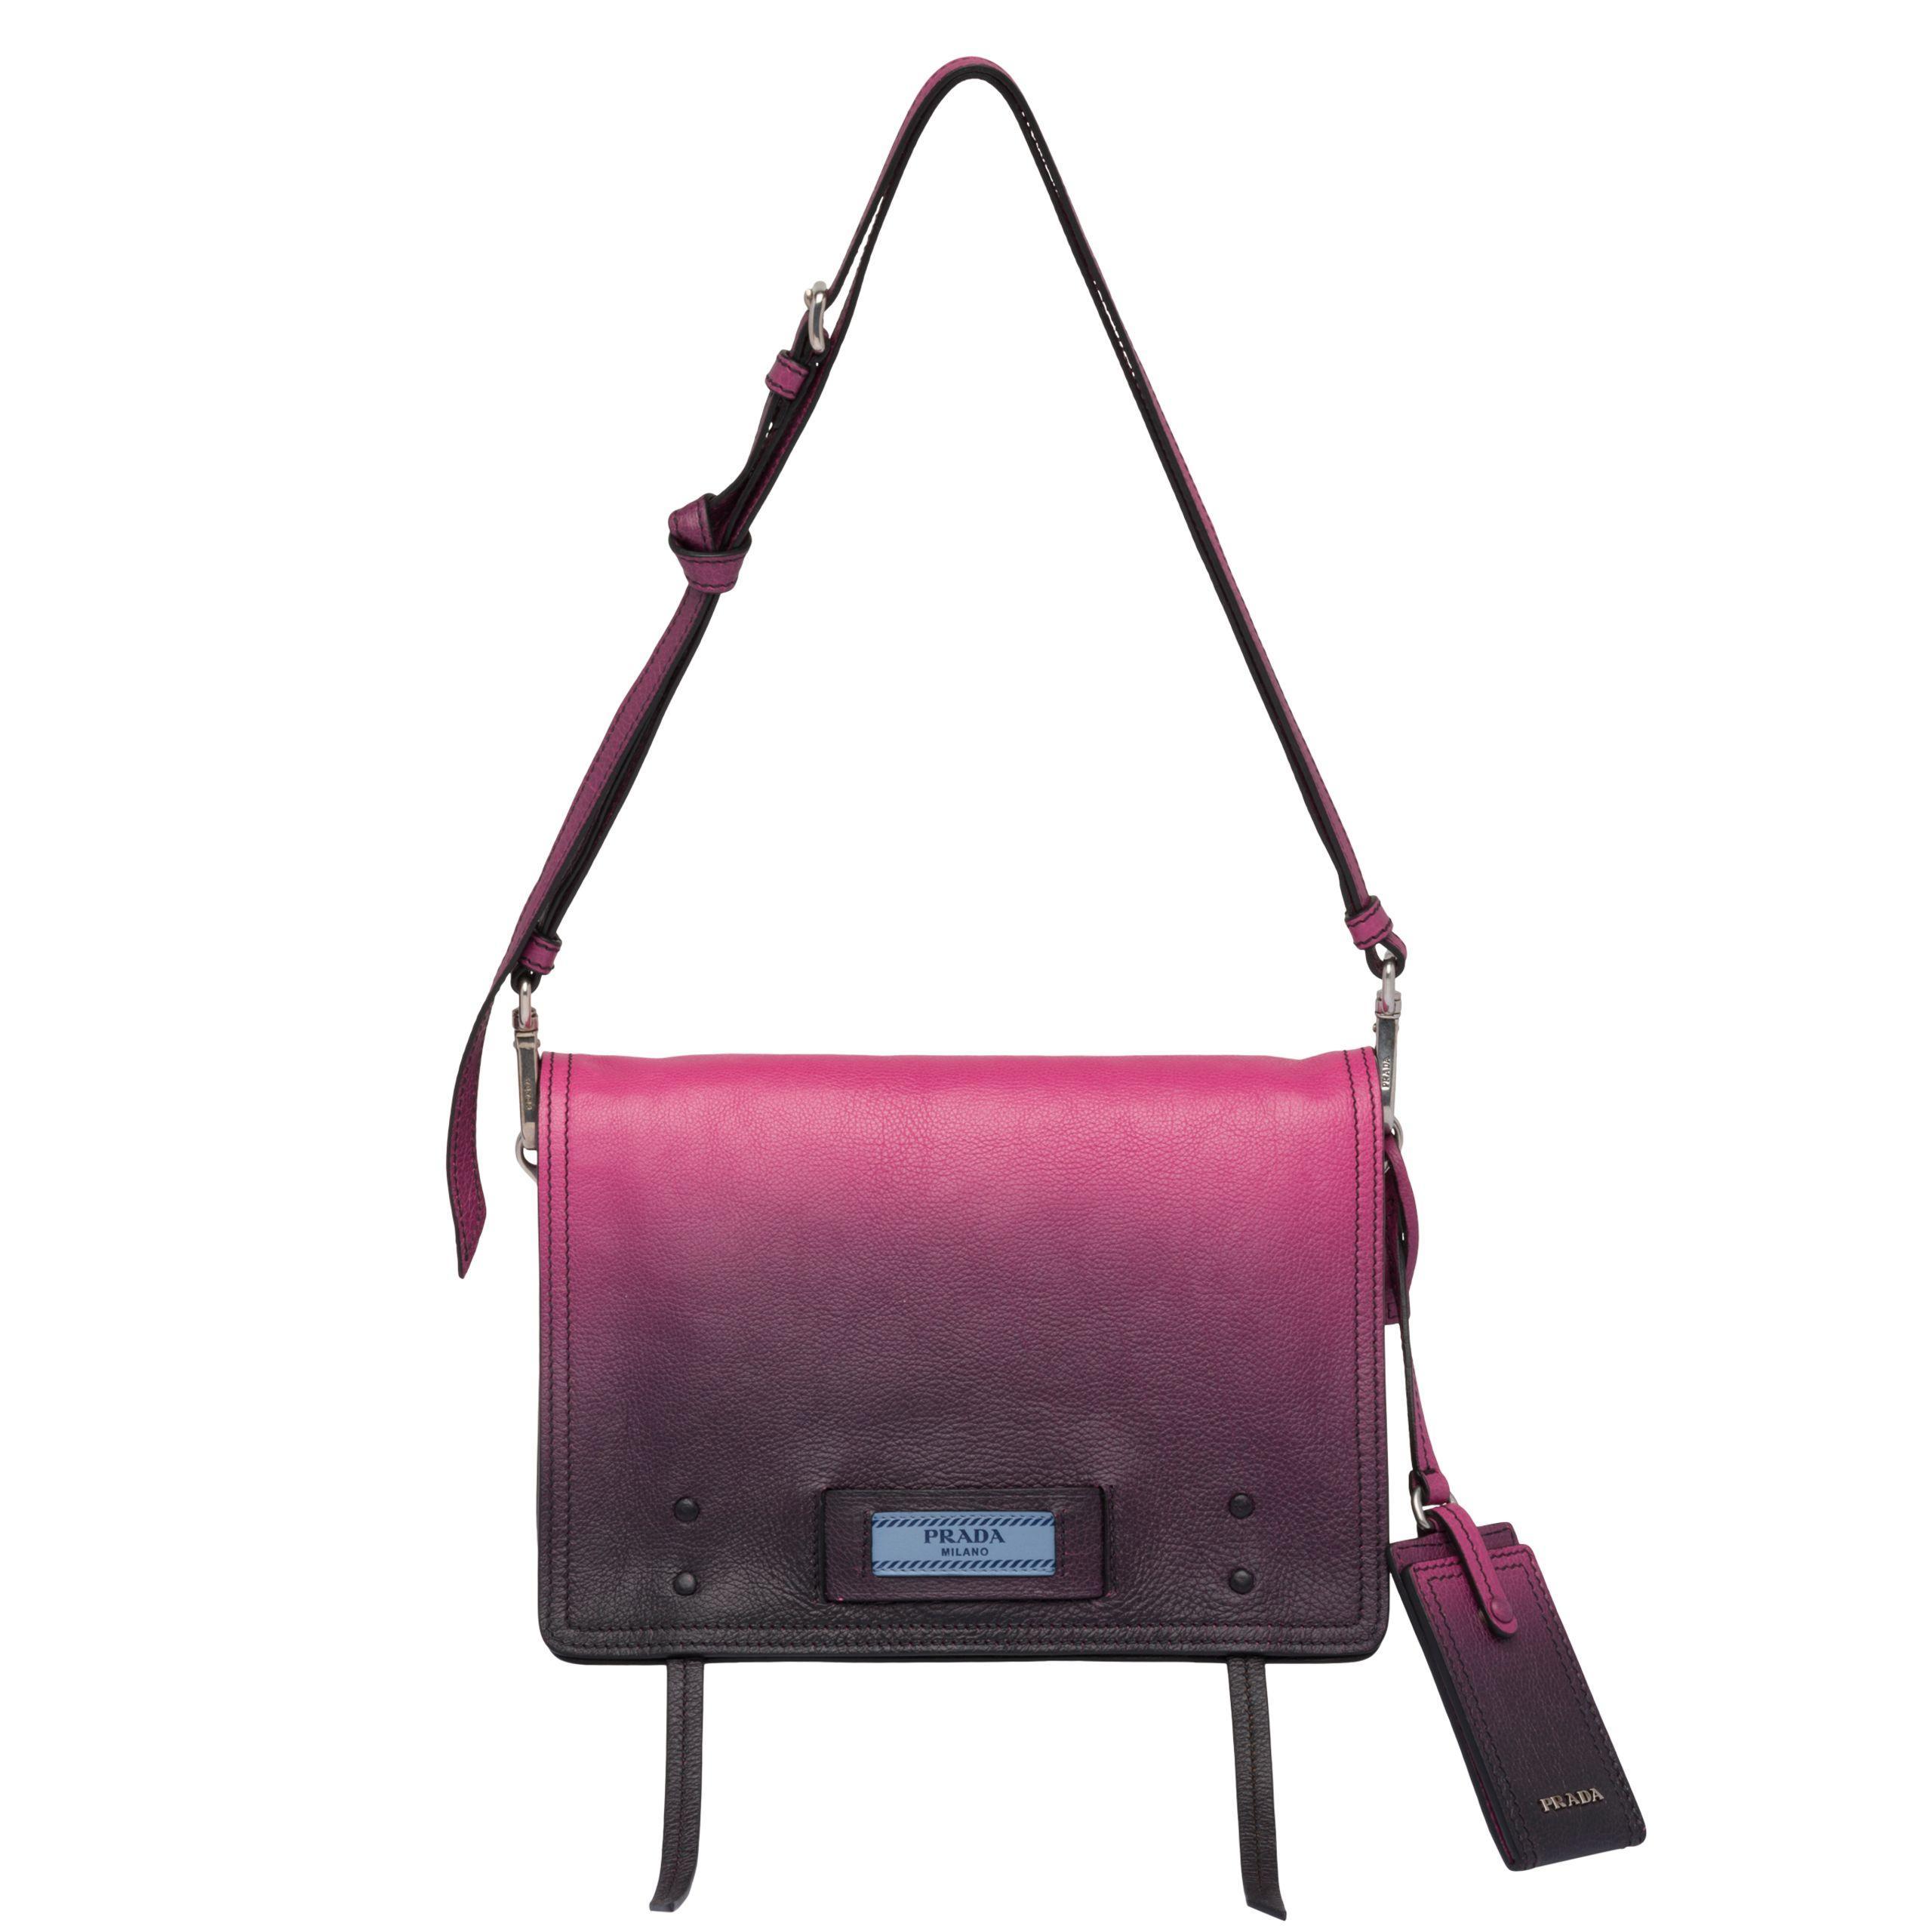 9e1d3de18e33 Prada - Purple Etiquette Leather Bag - Lyst. View fullscreen